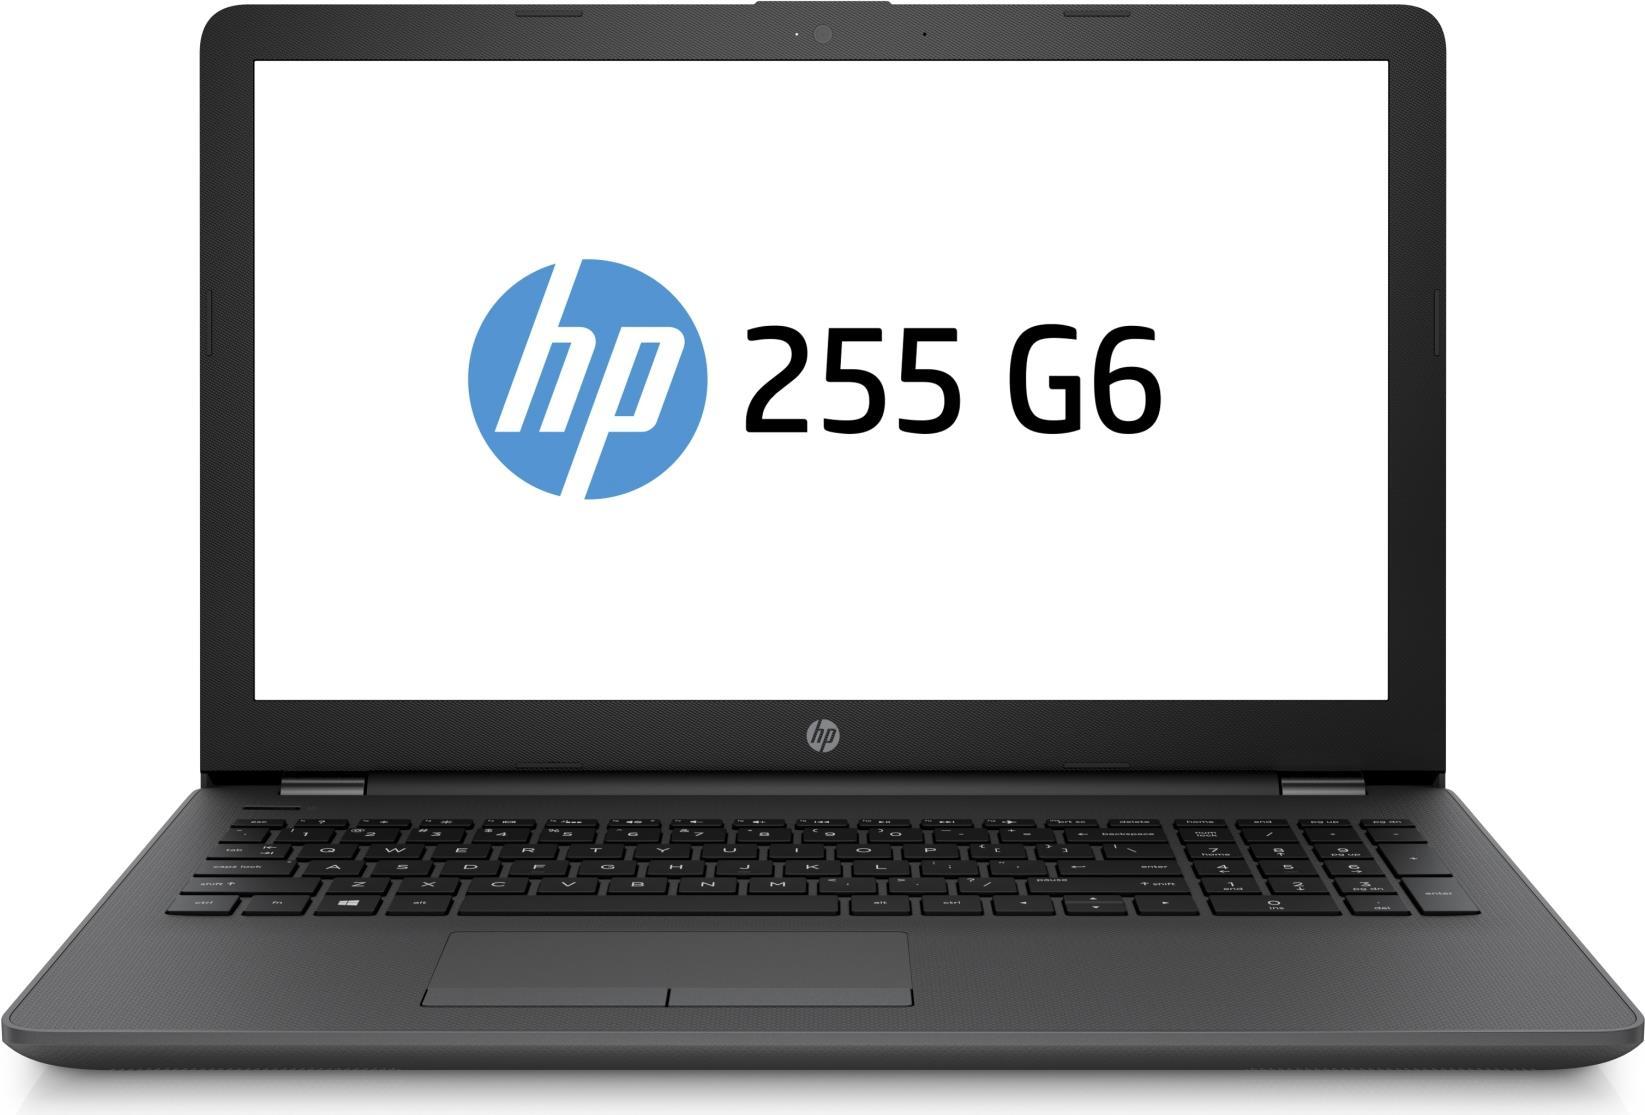 Notebooks, Laptops - Pavilion G6 39 15.6' Notebook 1,6 GHz 39,6 cm (3GJ24ES ABD)  - Onlineshop JACOB Elektronik